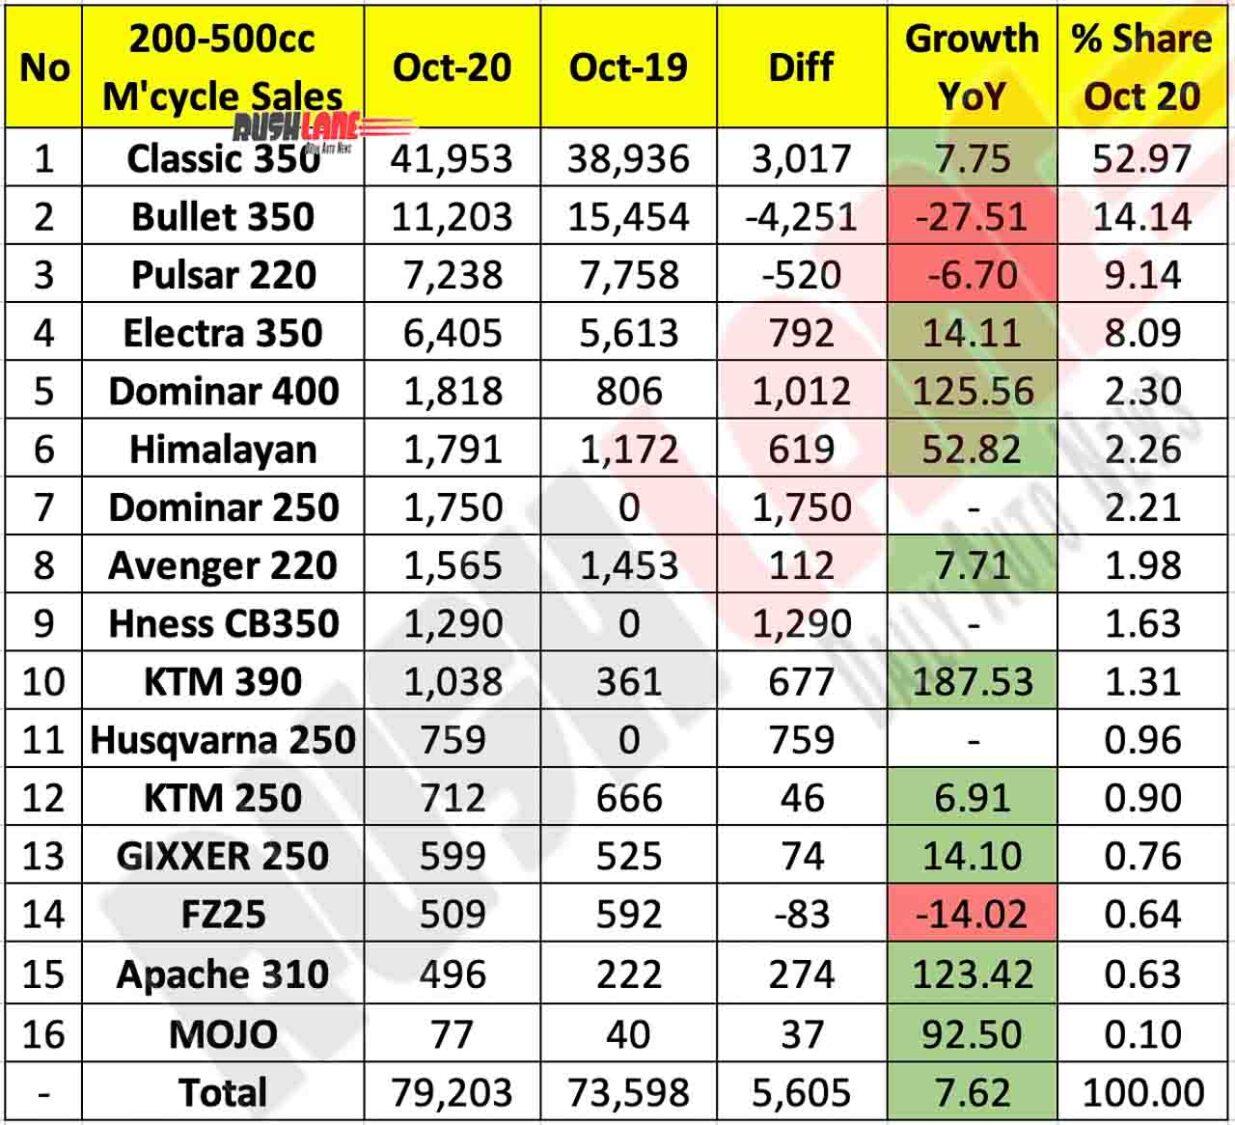 200cc-500cc Motorcycle Sales Oct 2020